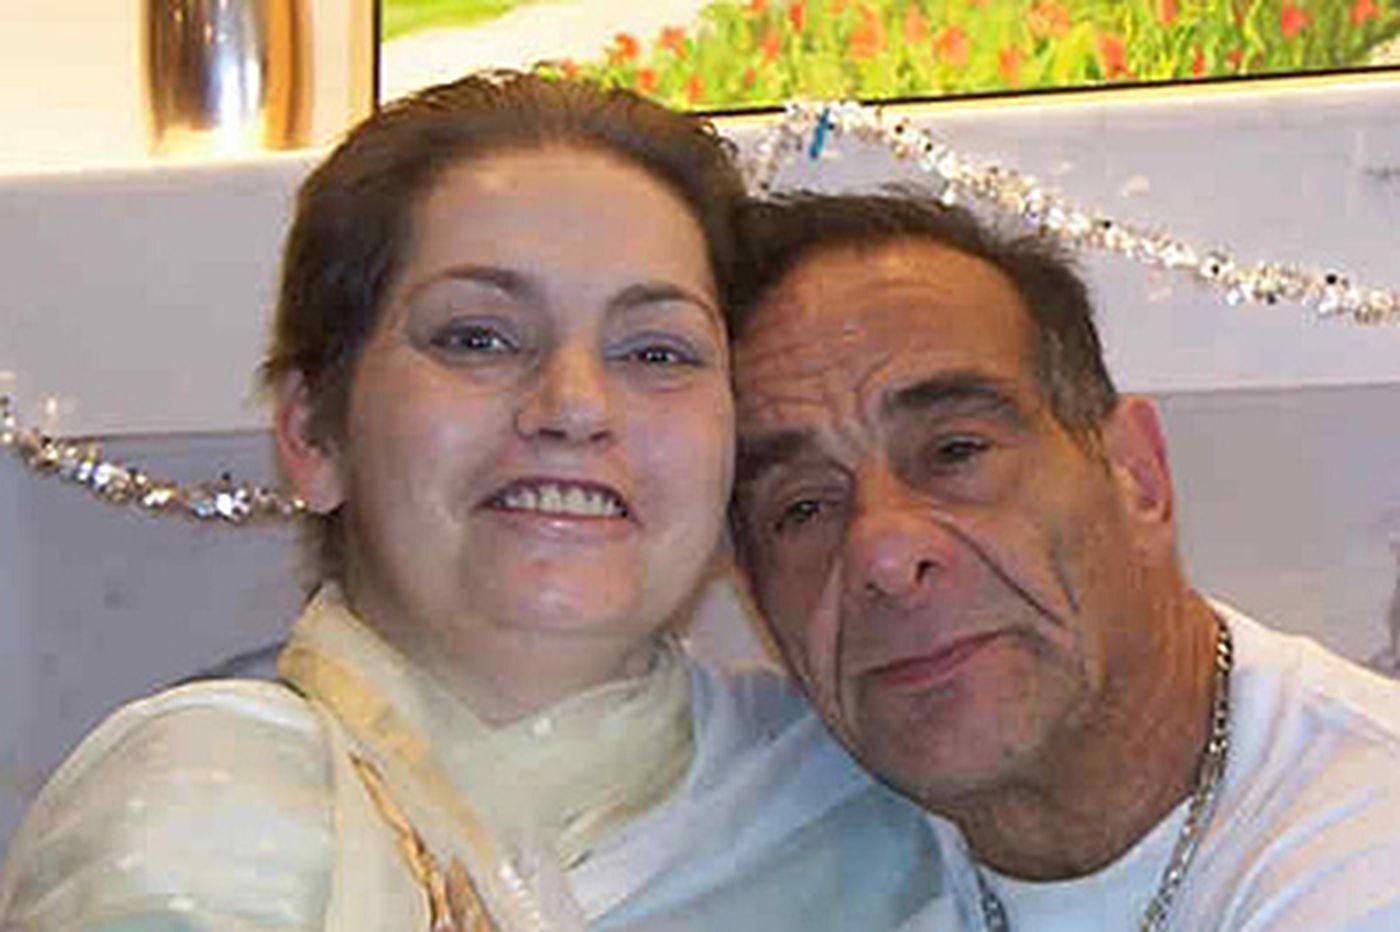 Daniel Rubin: Later in life, an ex-wiseguy finds love